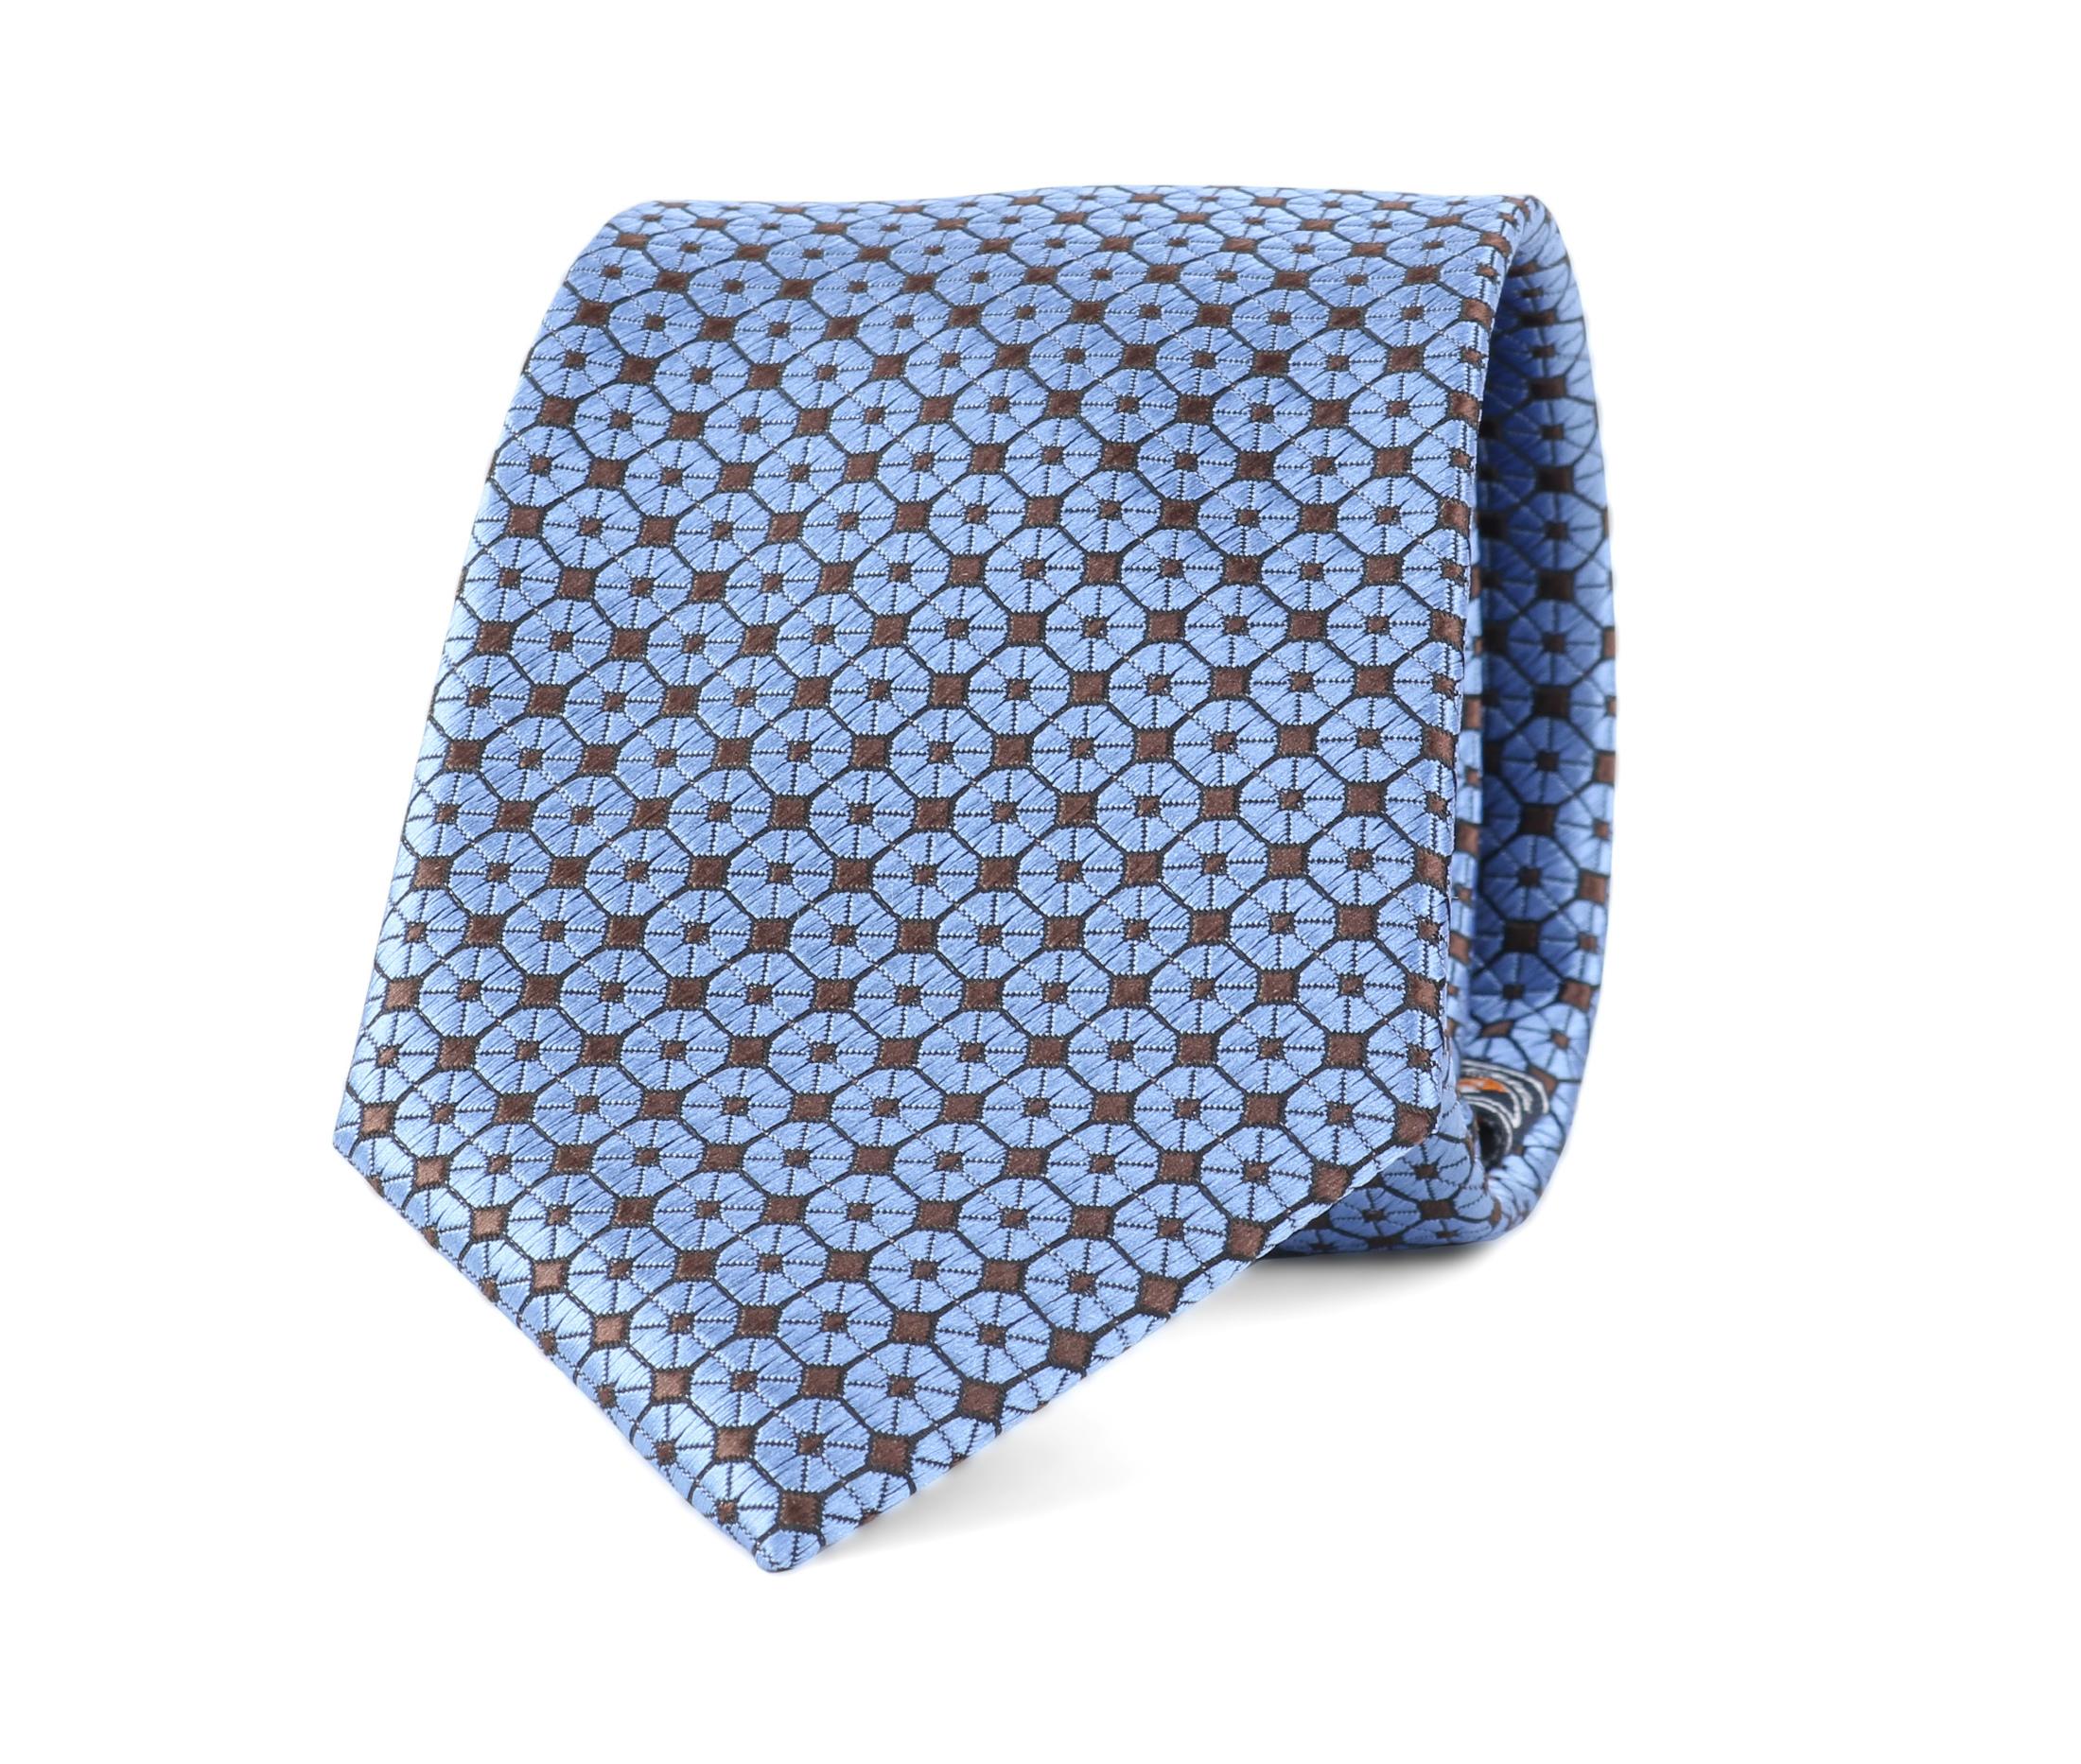 Krawatte Seide Dessin Blau 9-17 foto 0